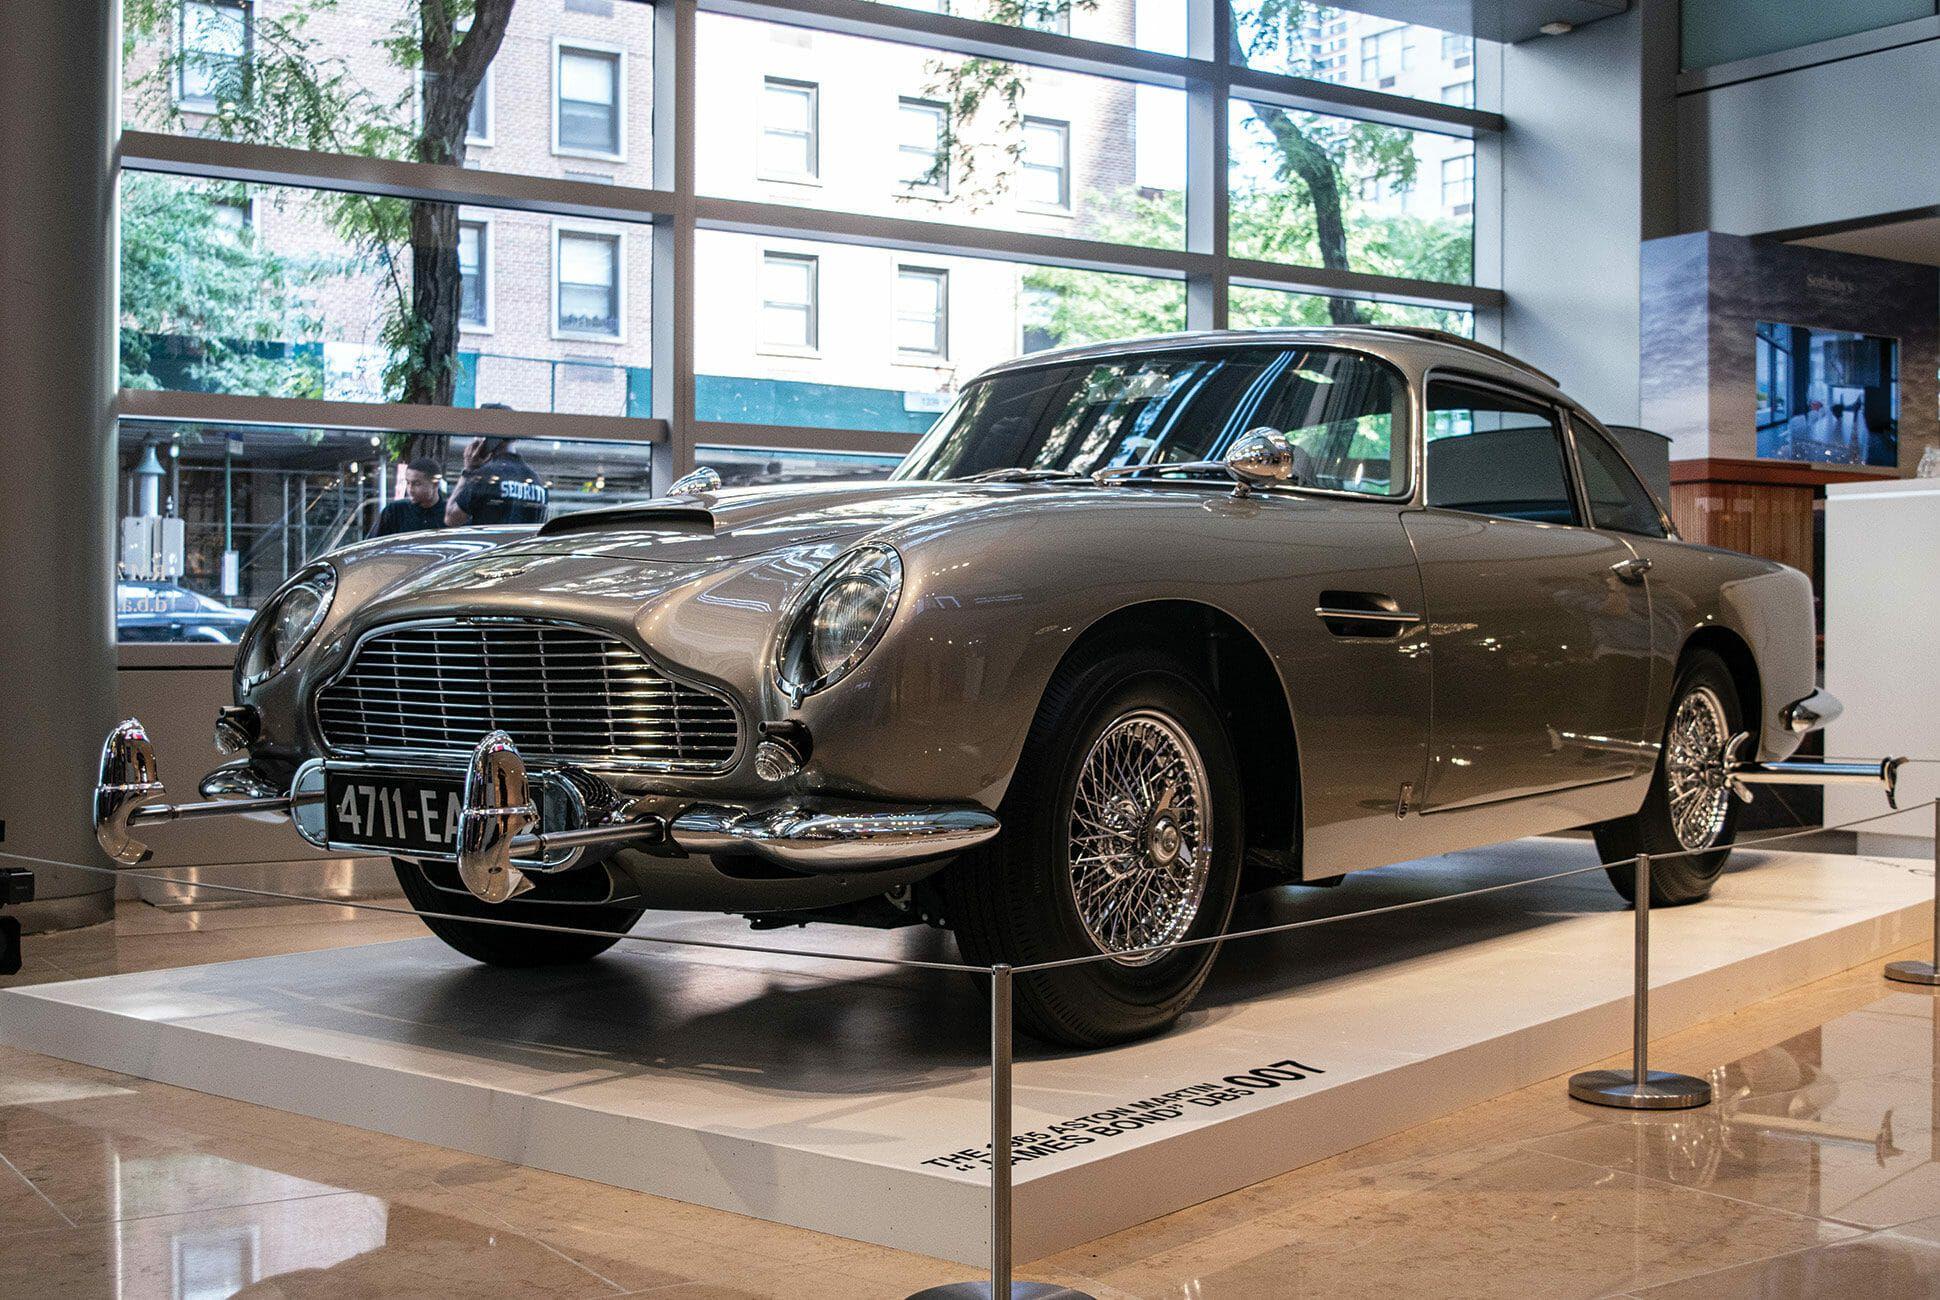 James Bond's Aston Martin Is Heading To Auction. We Saw It